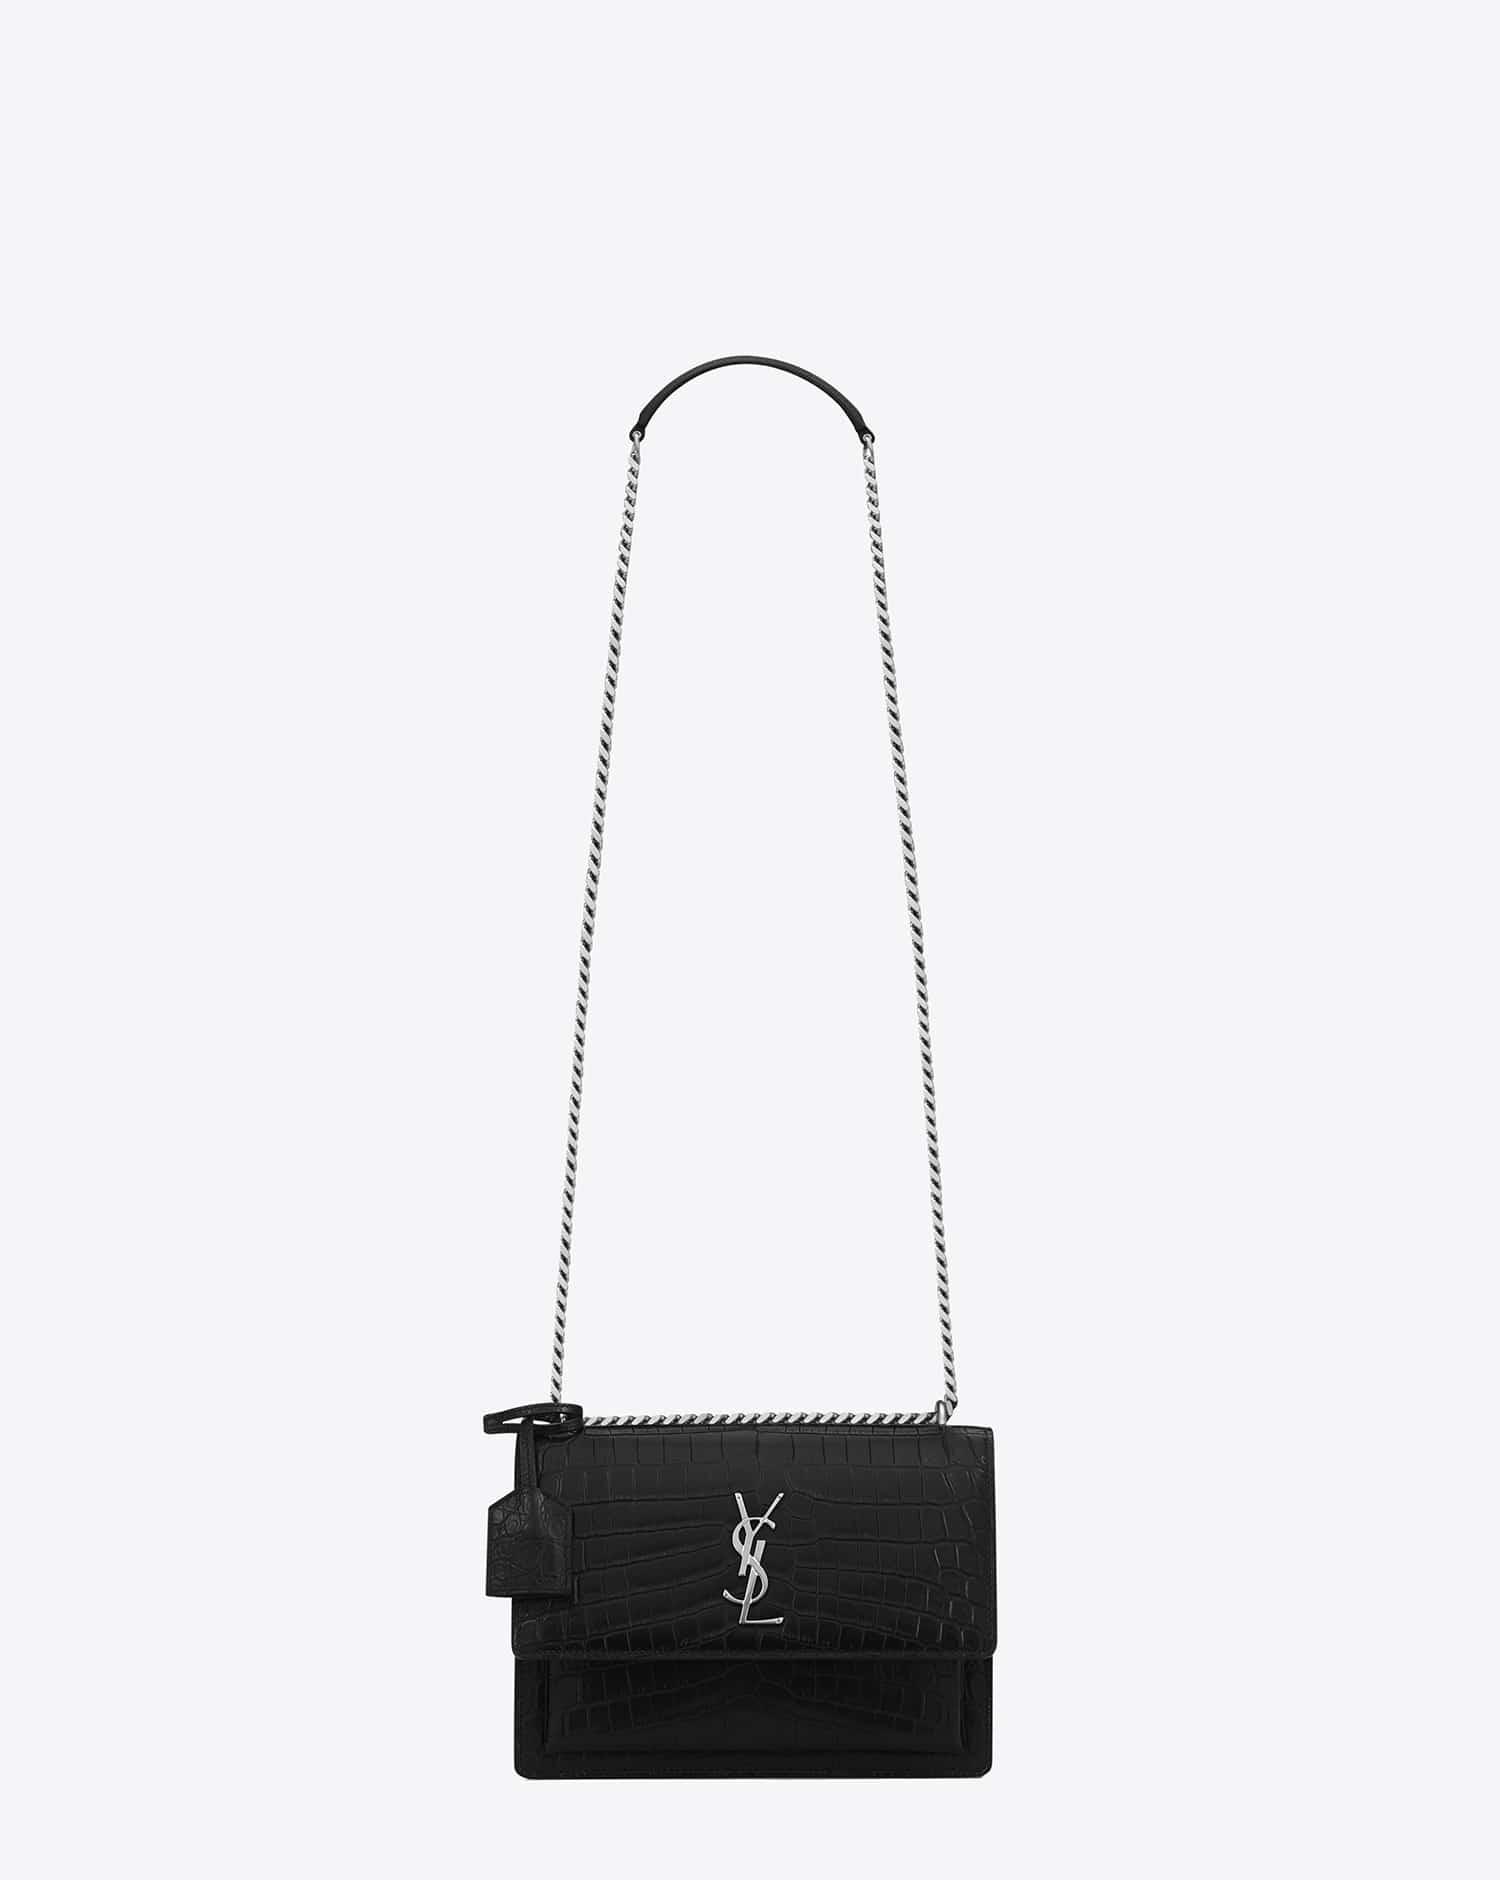 be2e59da8fe1 Saint Laurent Black Crocodile Embossed Medium Sunset Monogram Bag